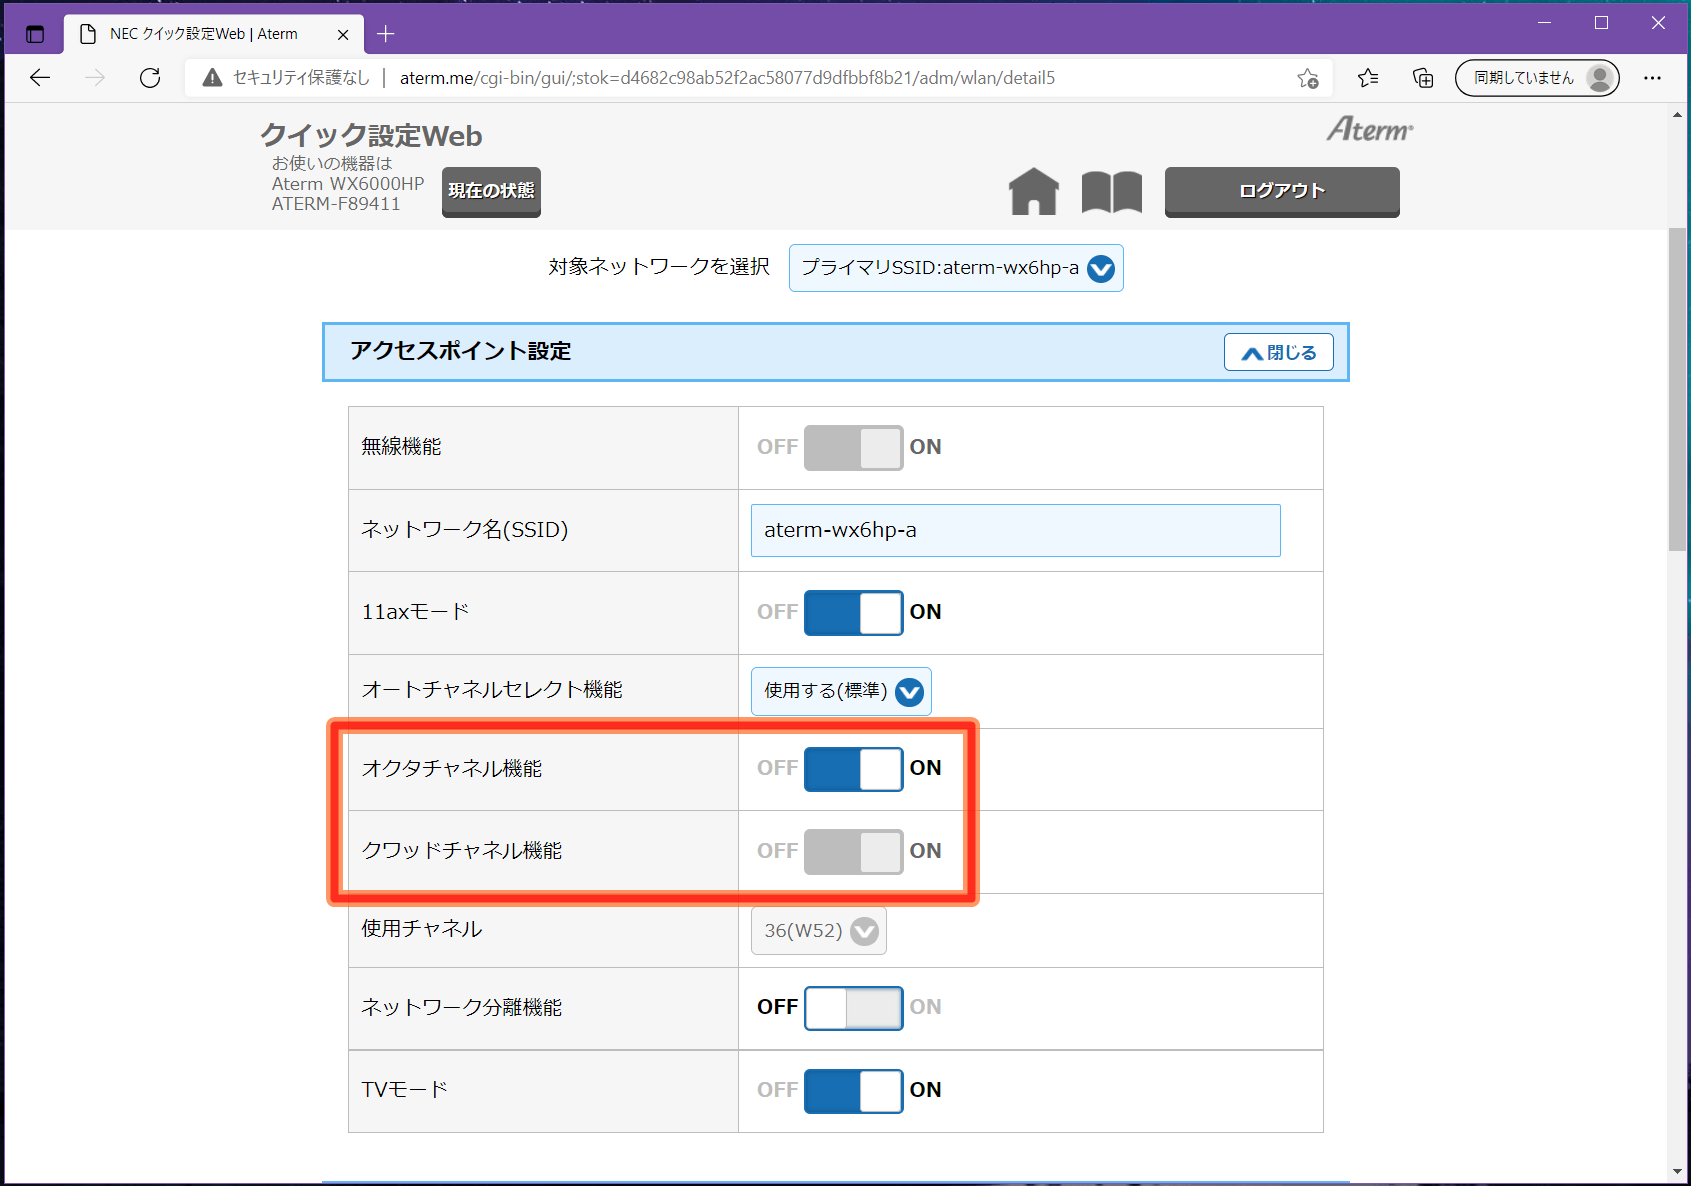 Aterm WX6000HP_settings_8c